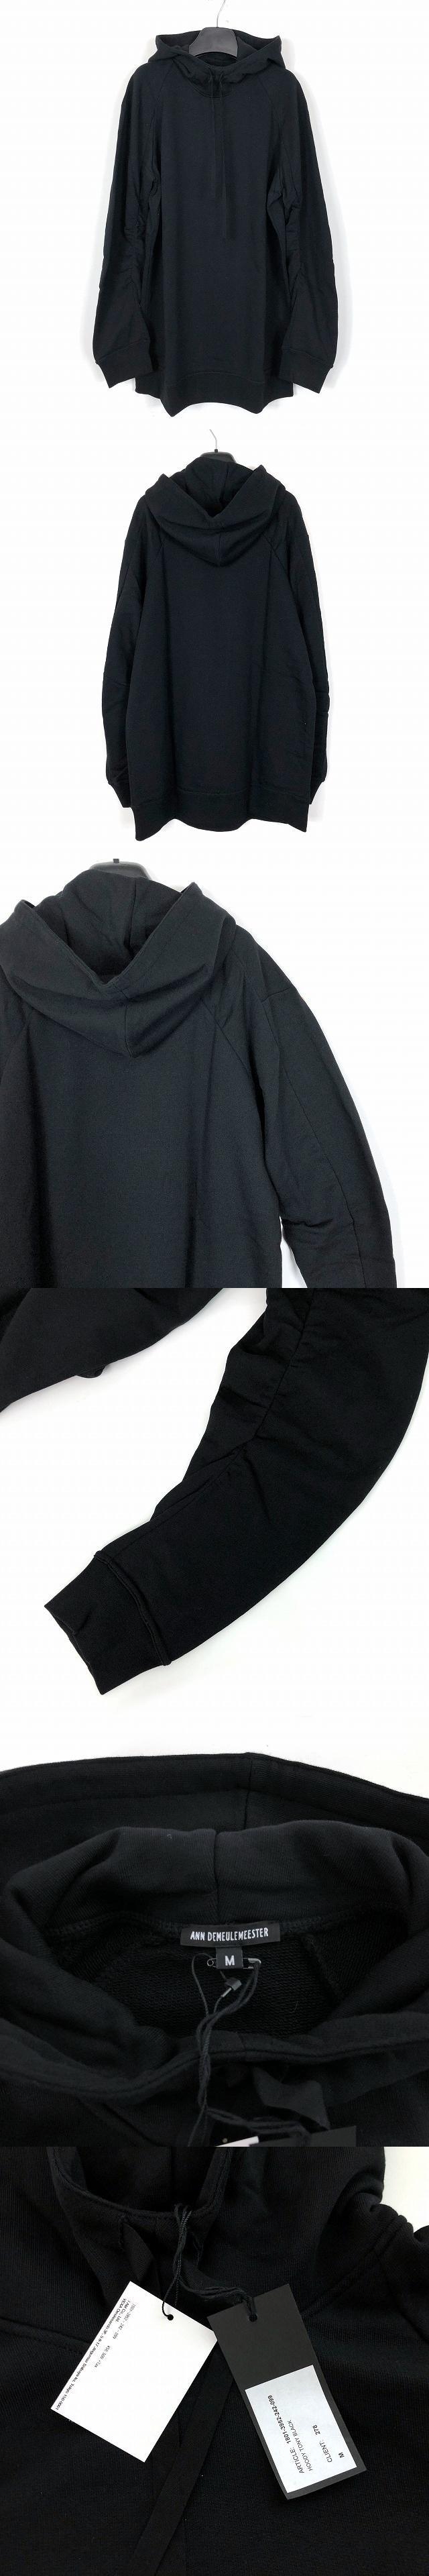 18SS シャーリングスリーブ プルオーバー パーカー ブラック 黒 M 1801-3952-242-099